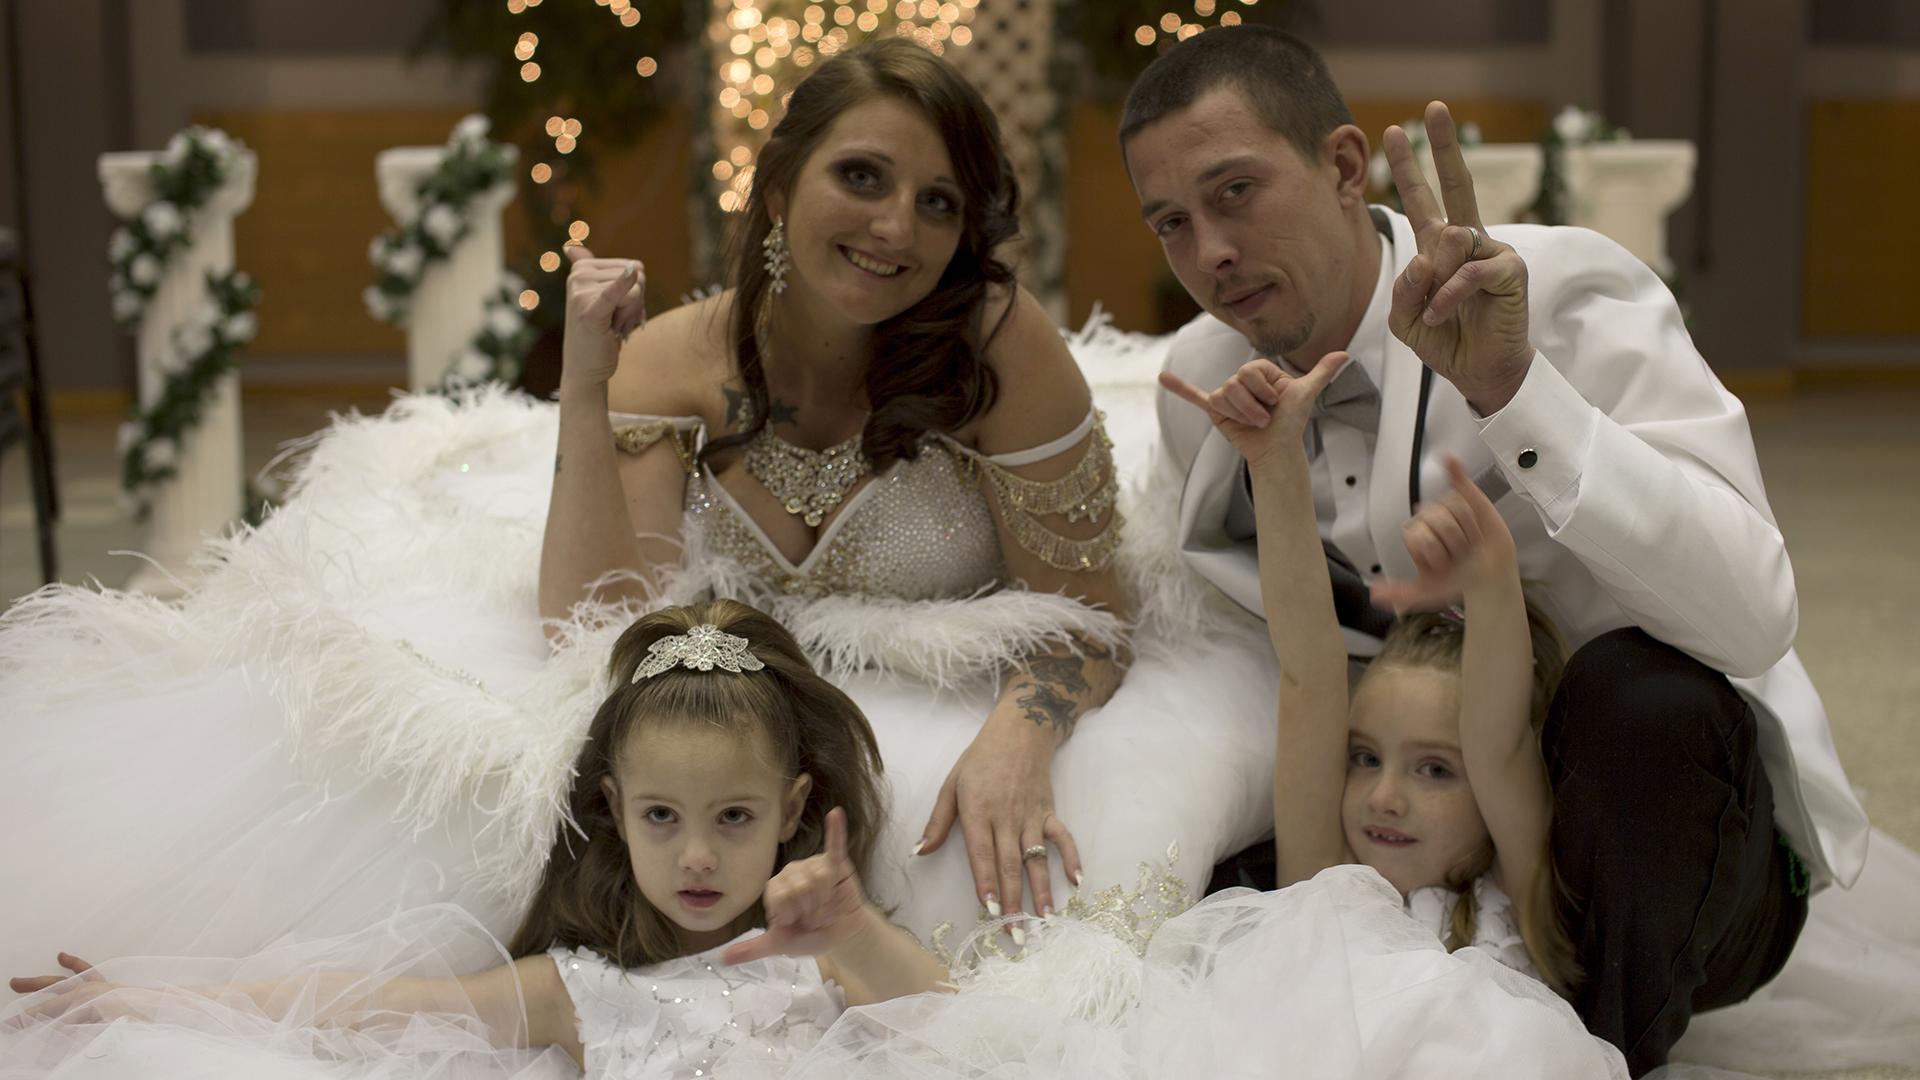 Matrimonio Gipsy Dplay : Il mio grosso grasso matrimonio gipsy usa episodio dplay